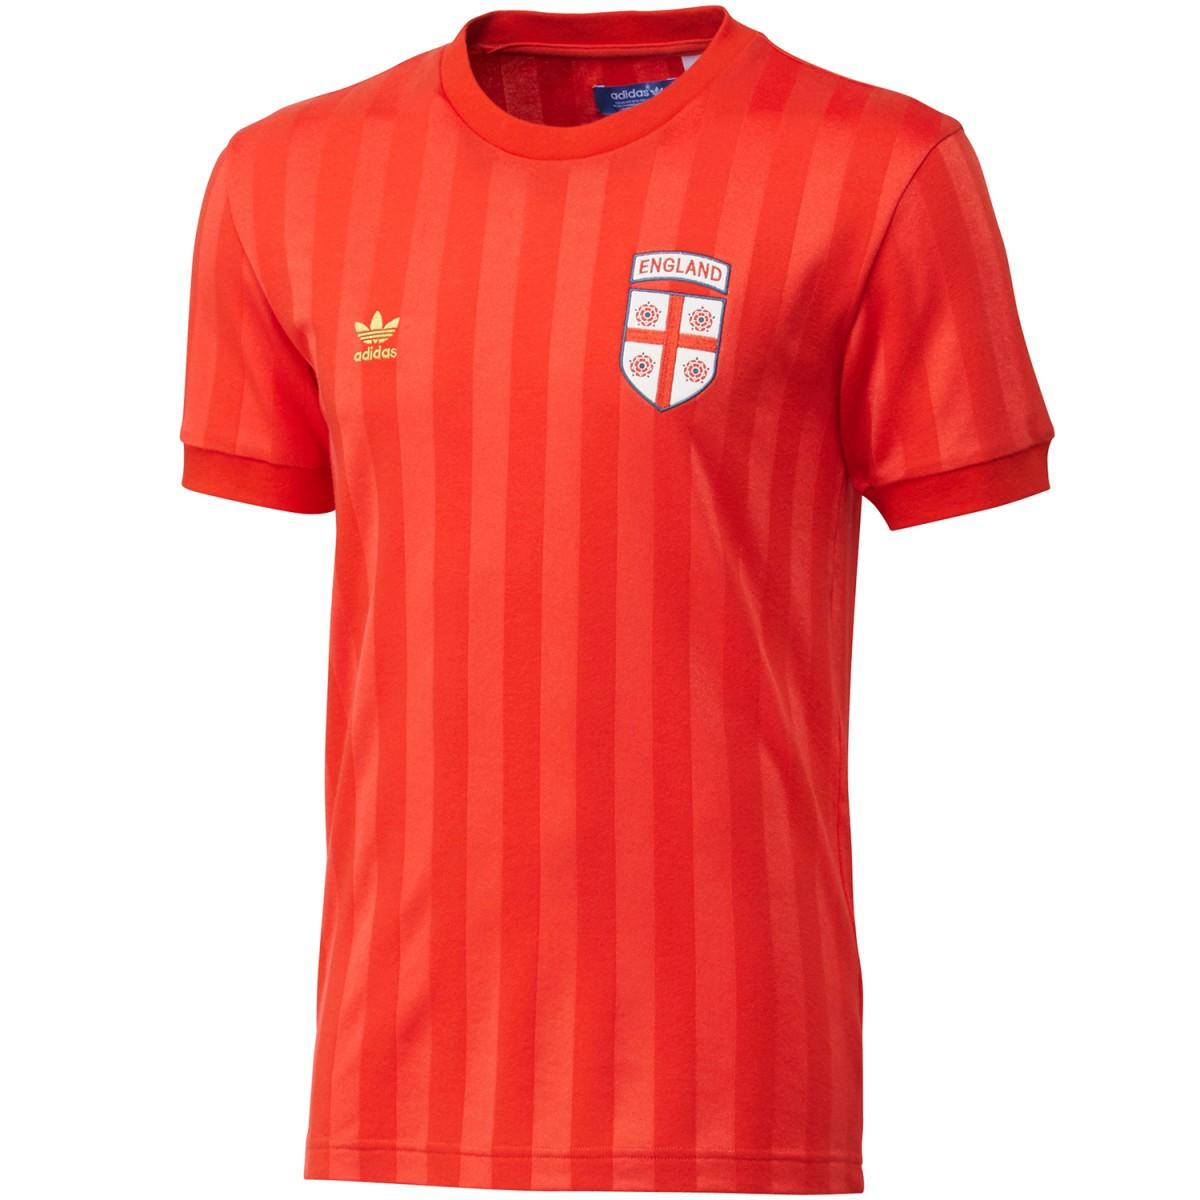 Camiseta Adidas England Retrô - Masculina  33722cbb381aa